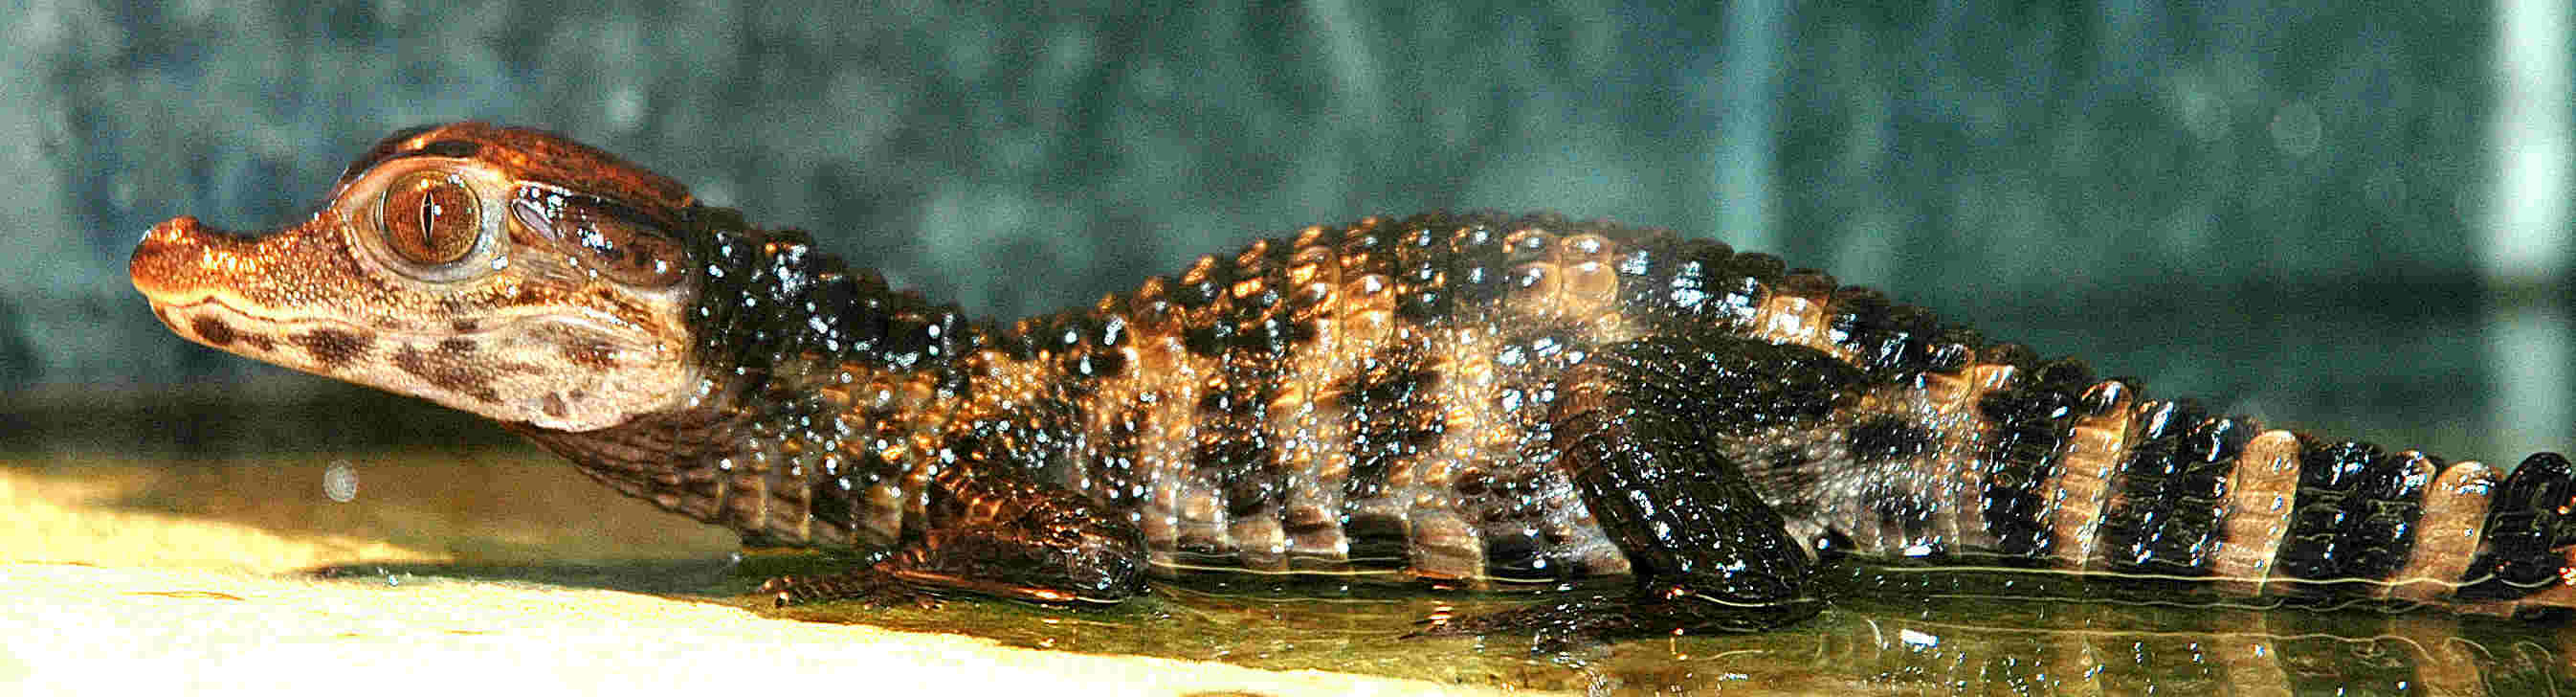 Paleosuchus palpebrosus hatchling Rdam Zoo 2 Dsc_0310 (2)